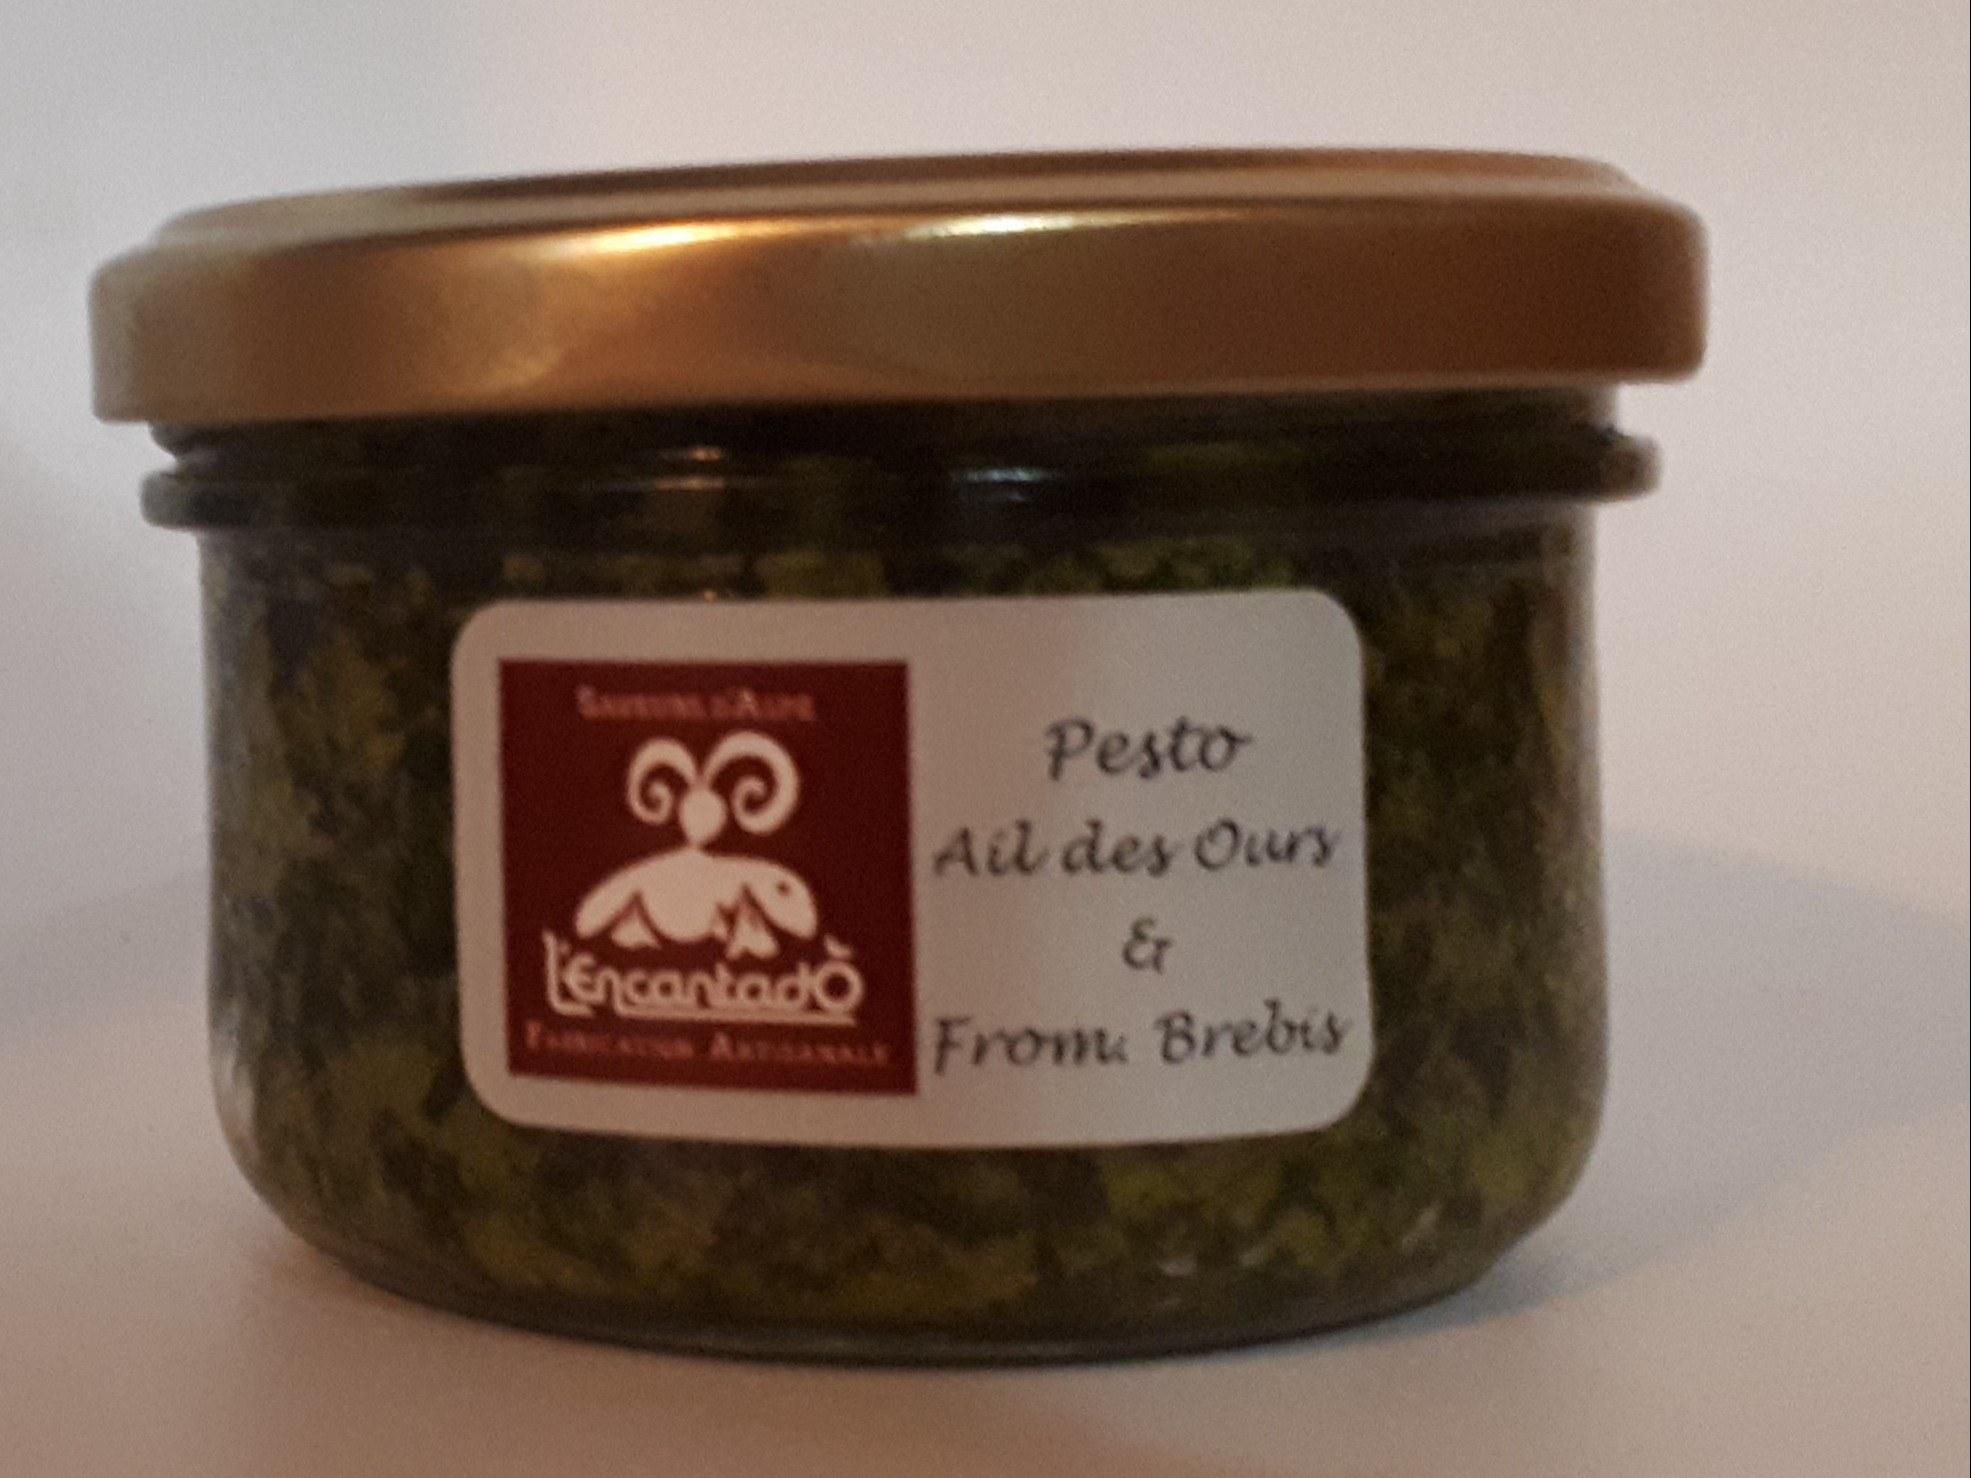 Art pesto ail des ours et fromage bredis